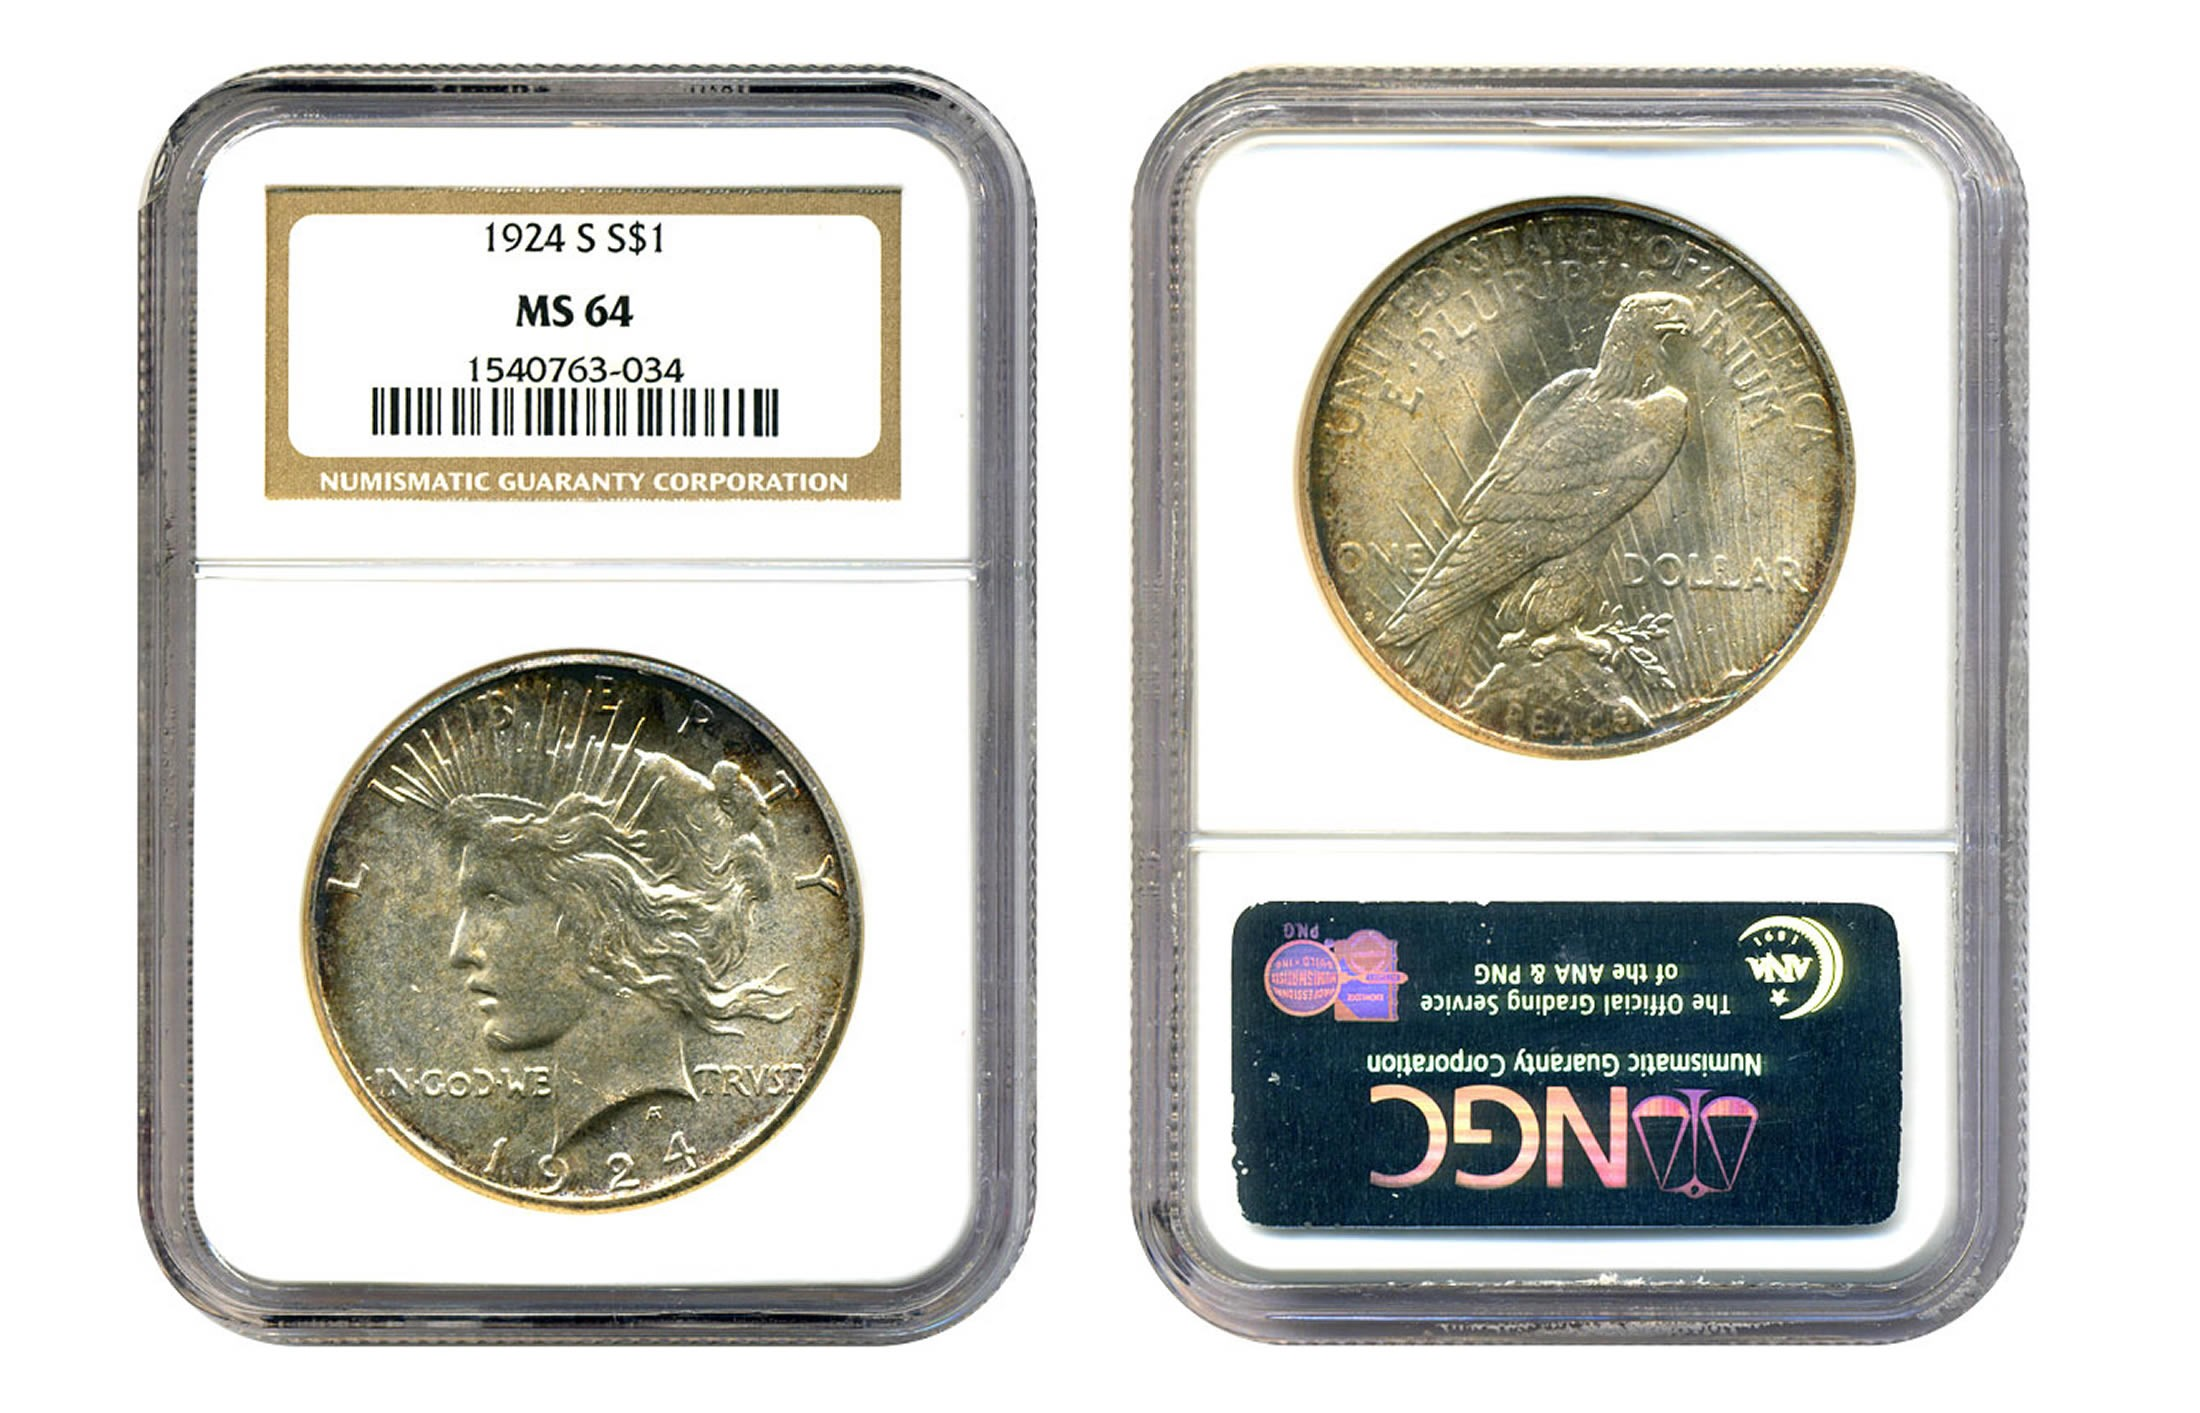 peace silver dollar coins 1 oz 1 face value ms64